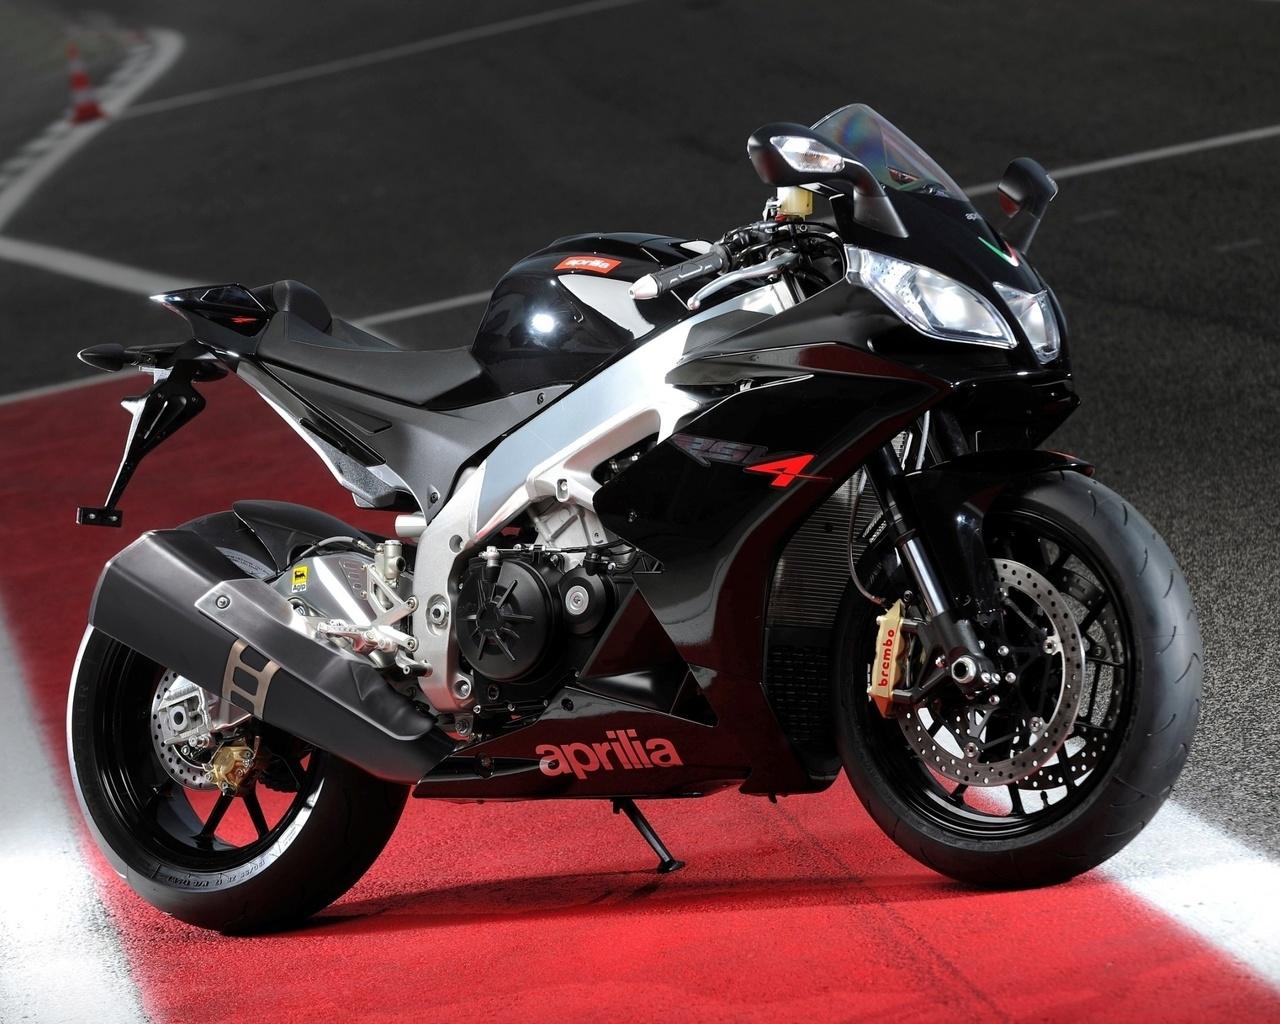 rsv 4 r, moto, aprilia, agip, brembo, мотоцикл